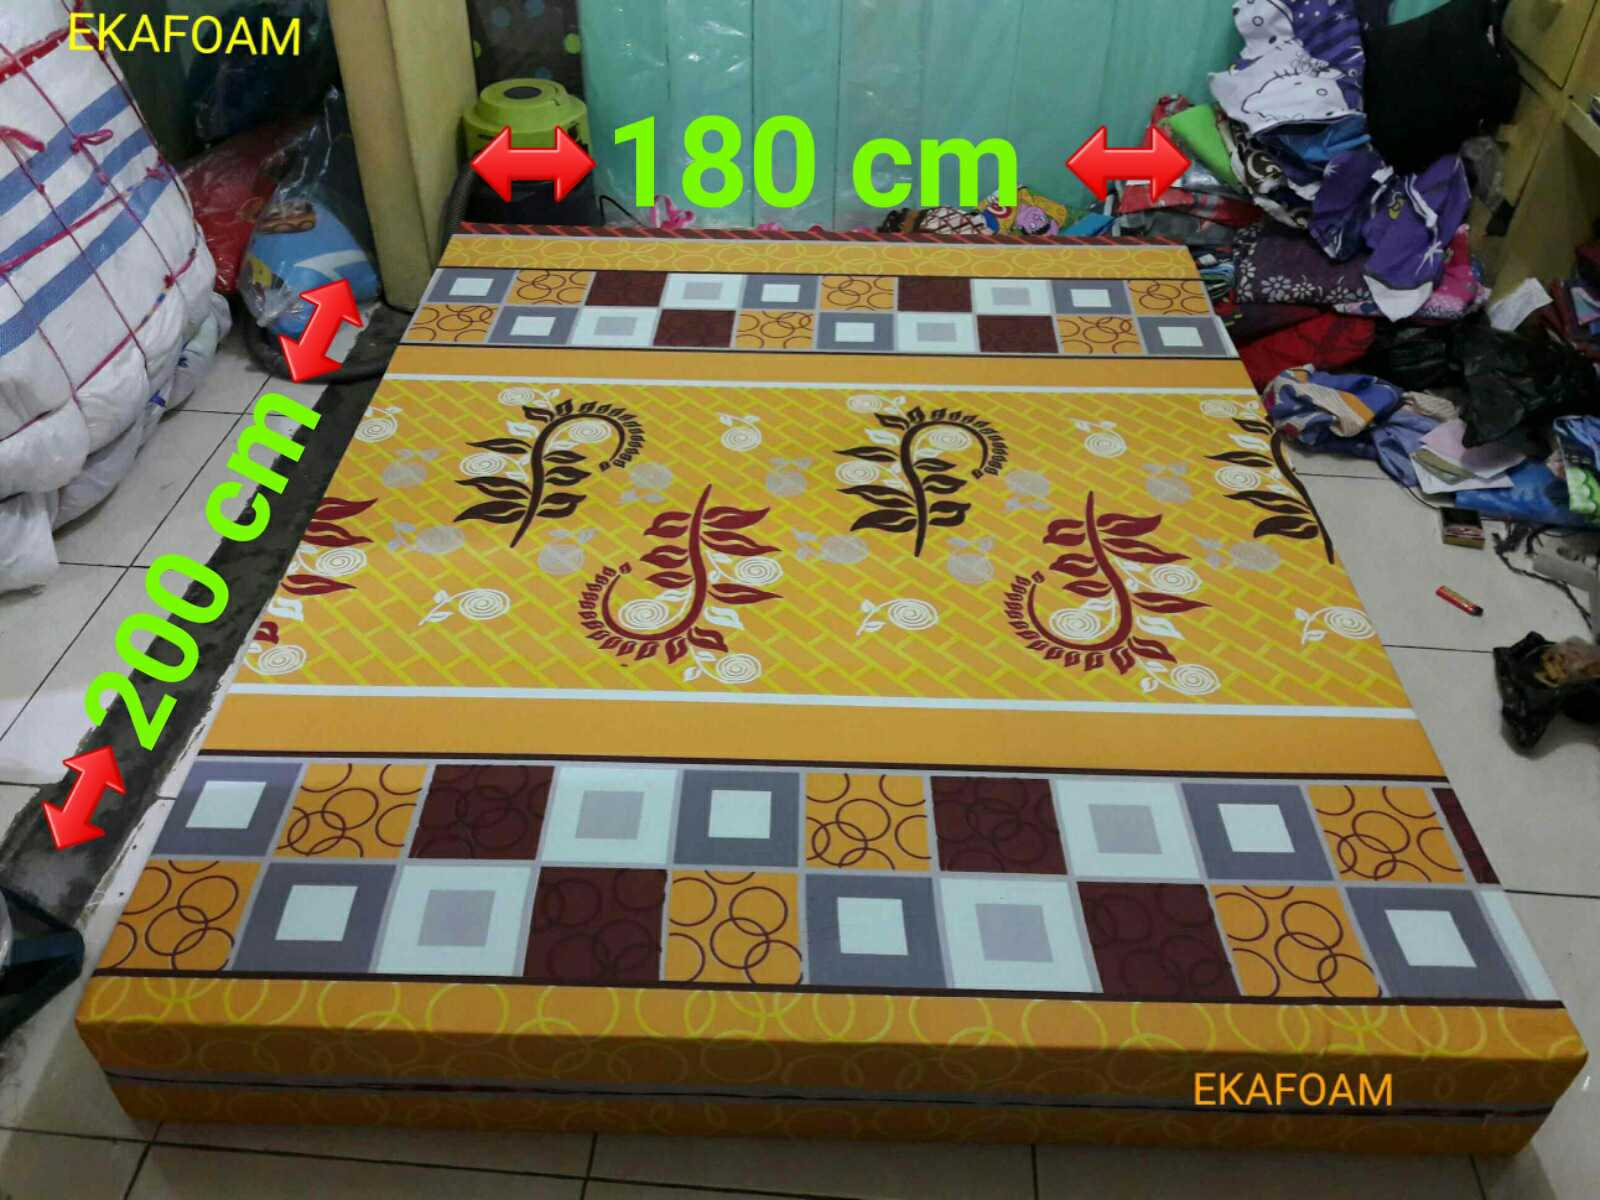 harga sofa bed inoac no 1 contemporary rattan kasur terbaru 19 januari 2017